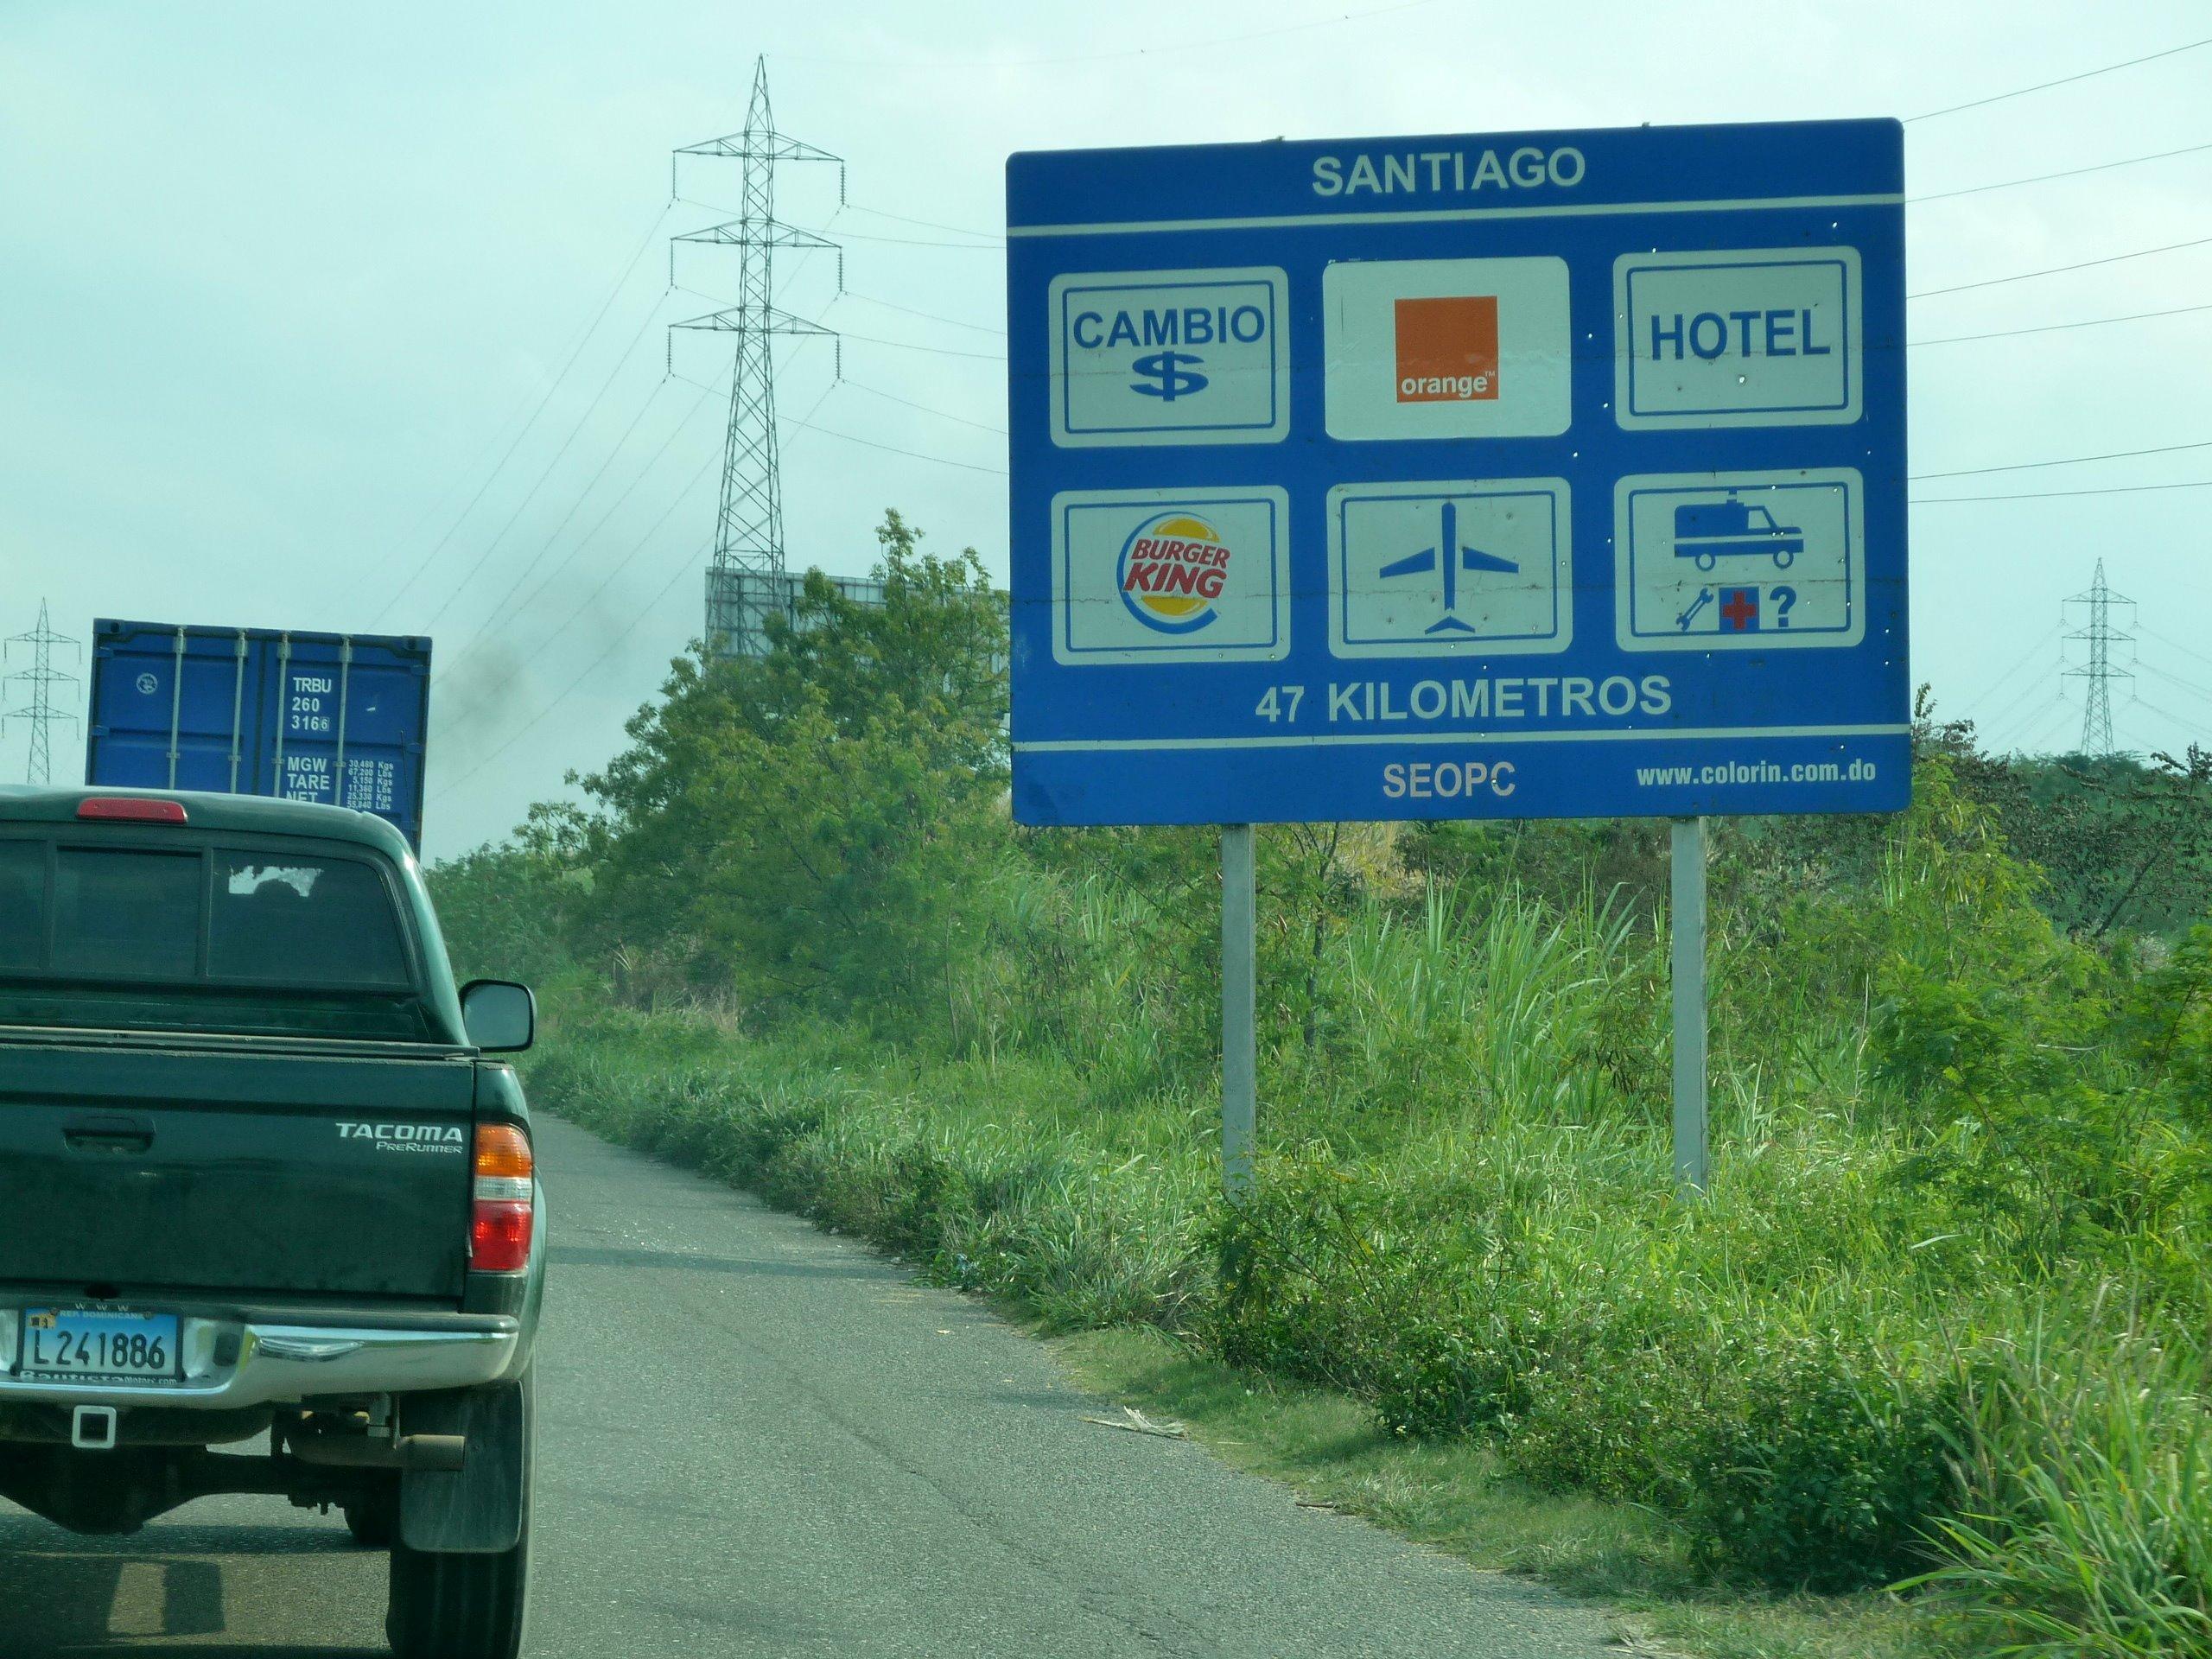 Dominican Republic road sign